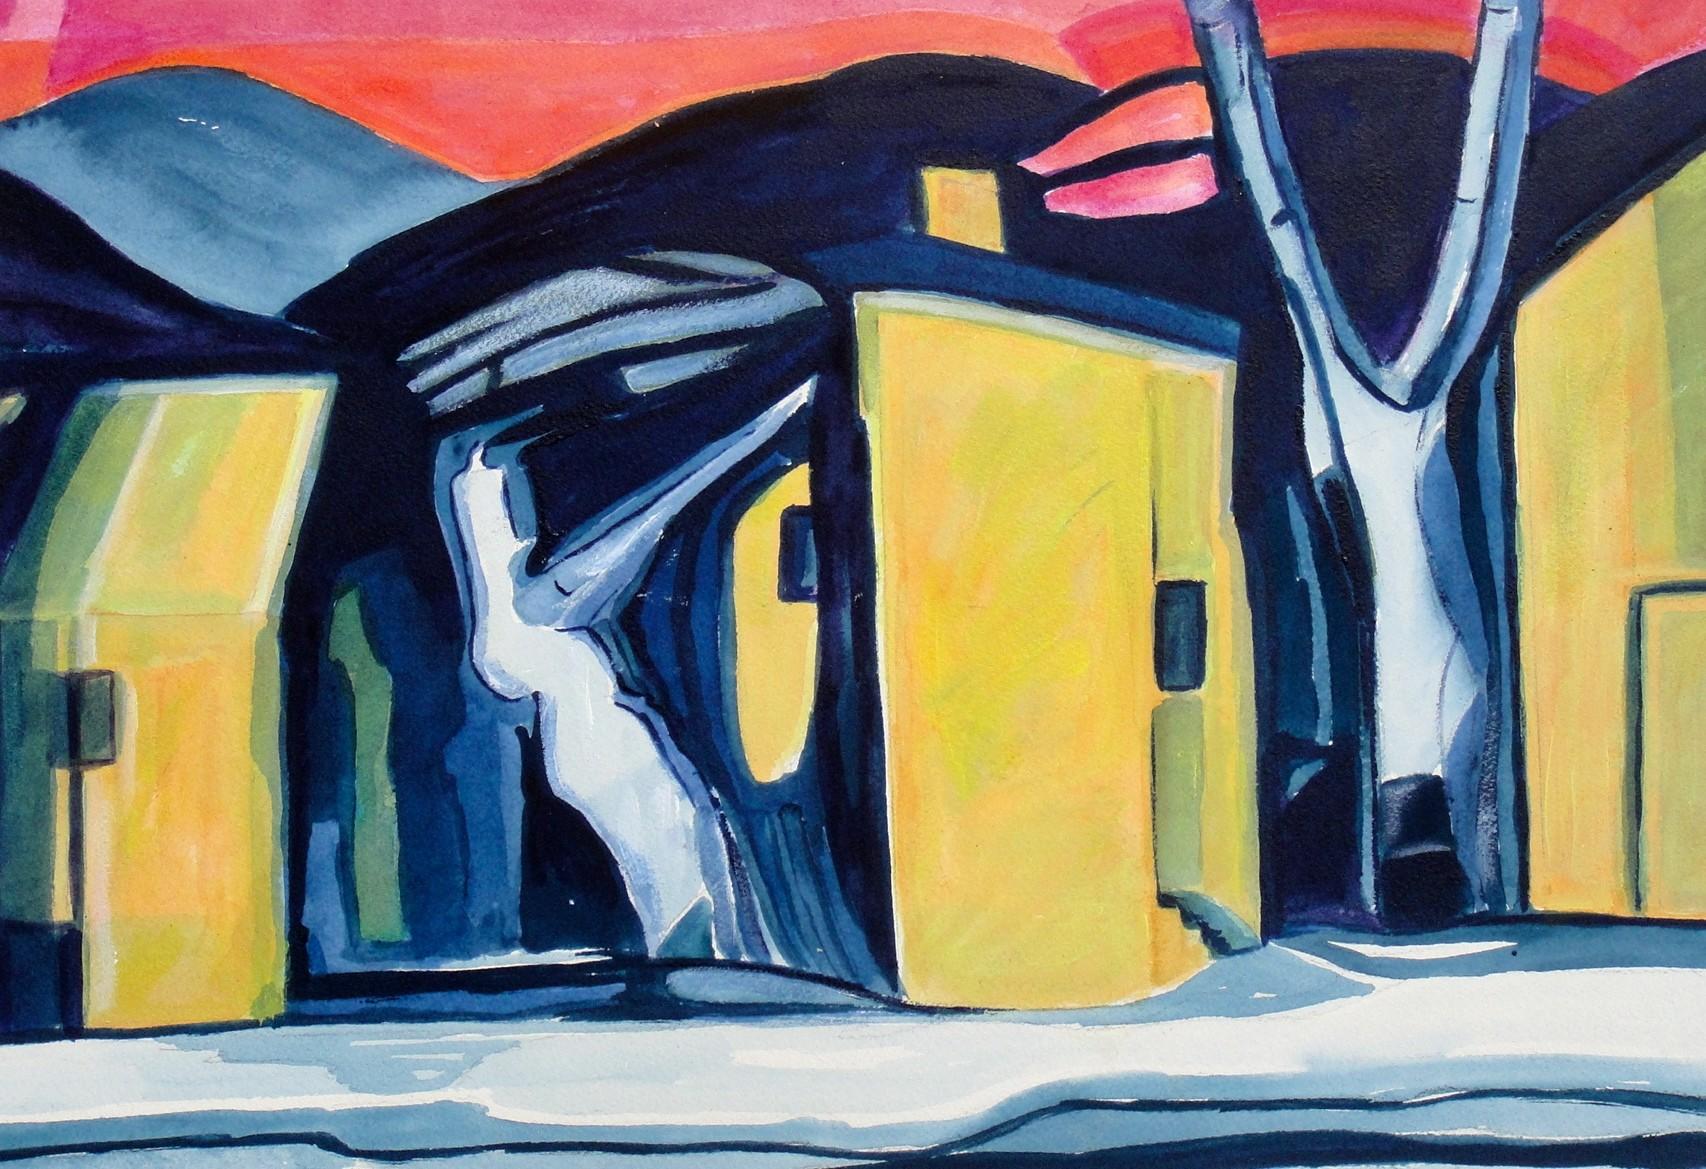 Winter Solstice, watercolor, 18.5 x 12.5, 2014